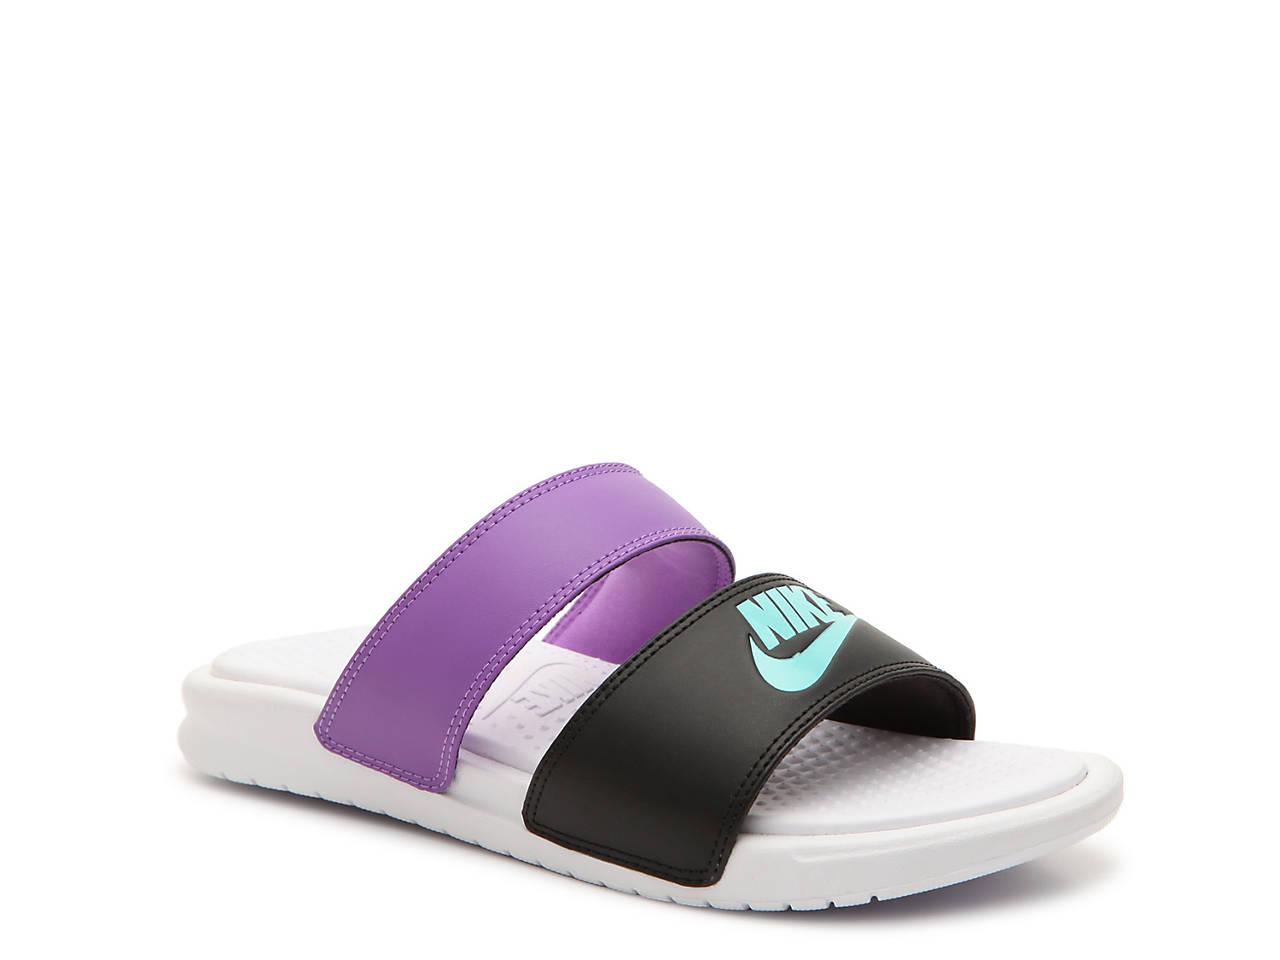 sports shoes b829a 776b7 Benassi Duo Ultra Slide Sandal - Women's